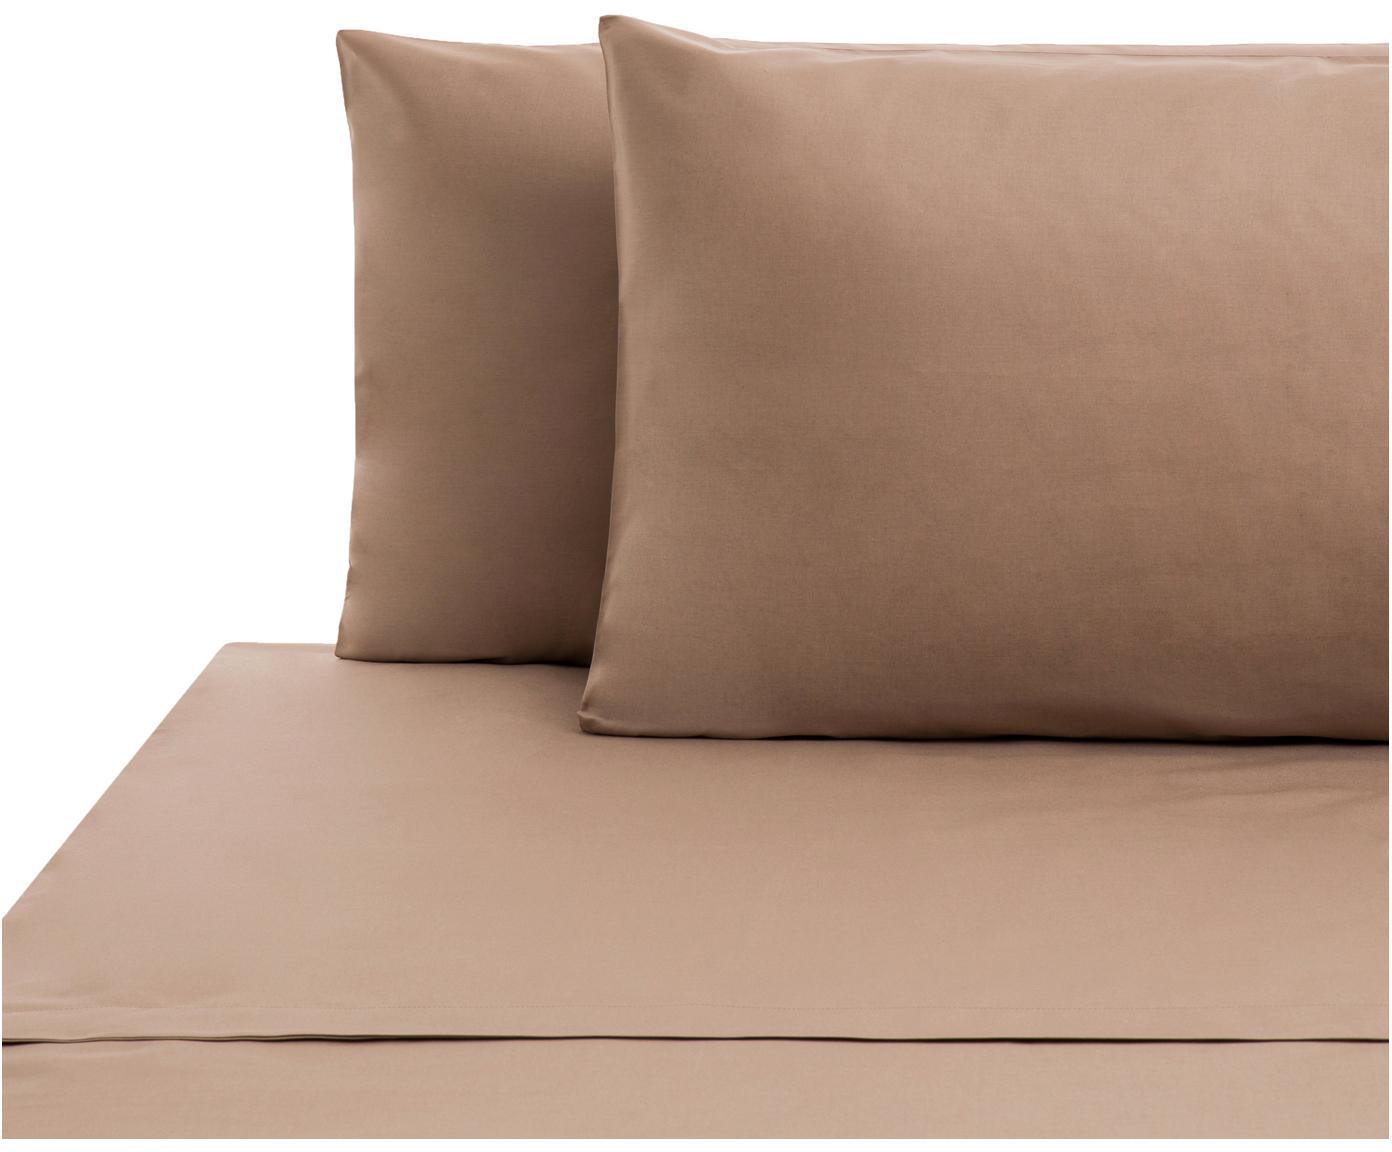 Set lenzuola in cotone ranforce Lenare 2 pz, Tessuto: Renforcé, Fronte e retro: taupe, 240 x 290 cm